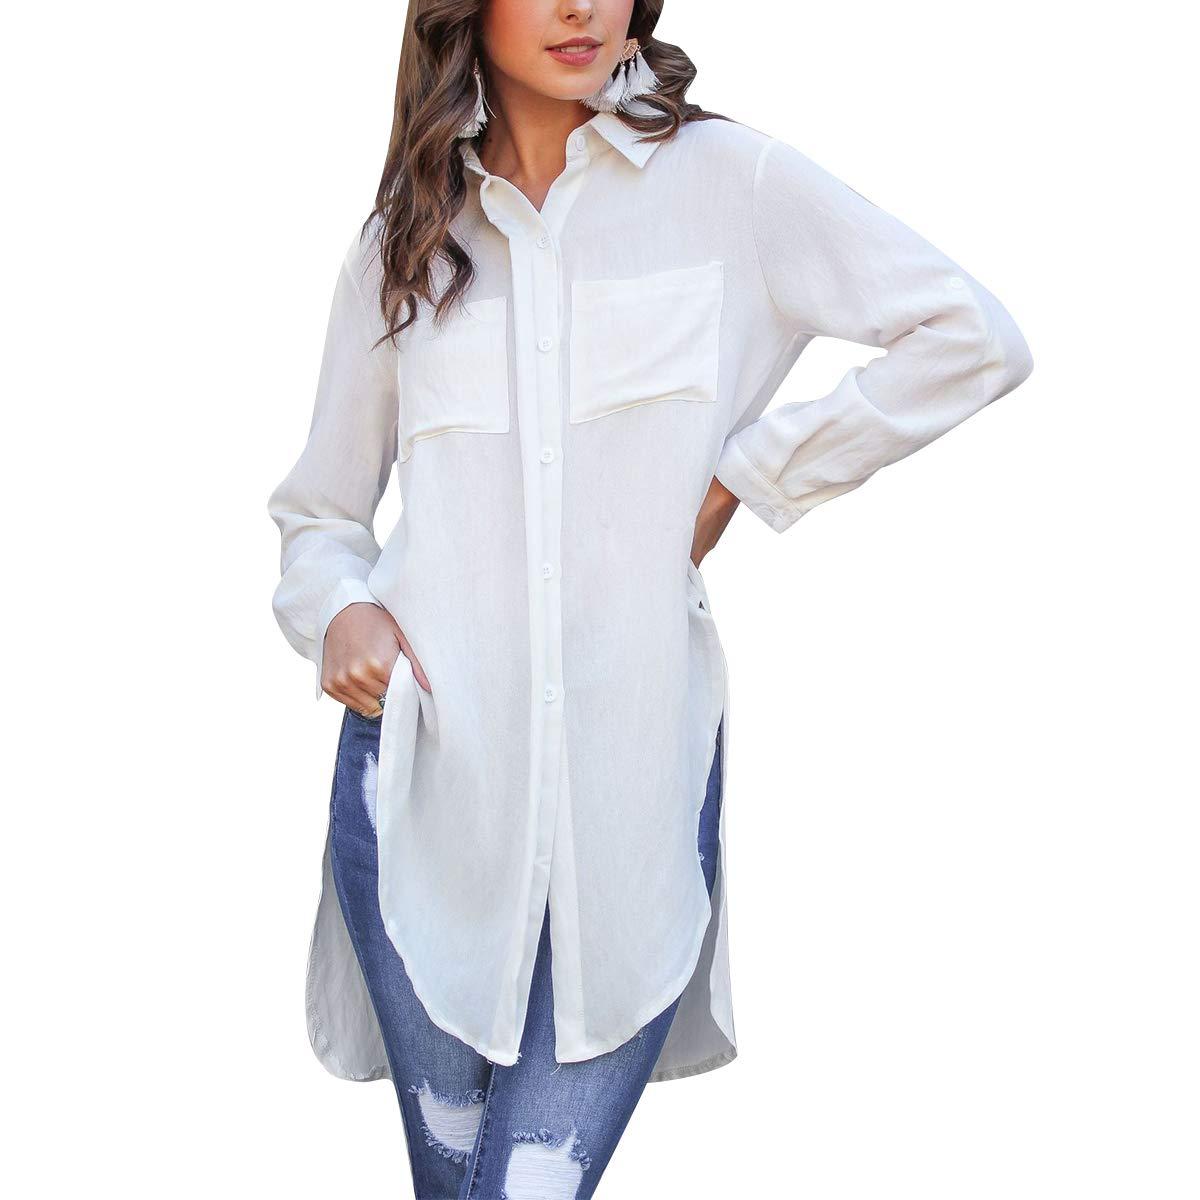 White Flextiicinax Side Split Button Down Shirts Women Lapel Roll Up Long Sleeve Loose Blouse